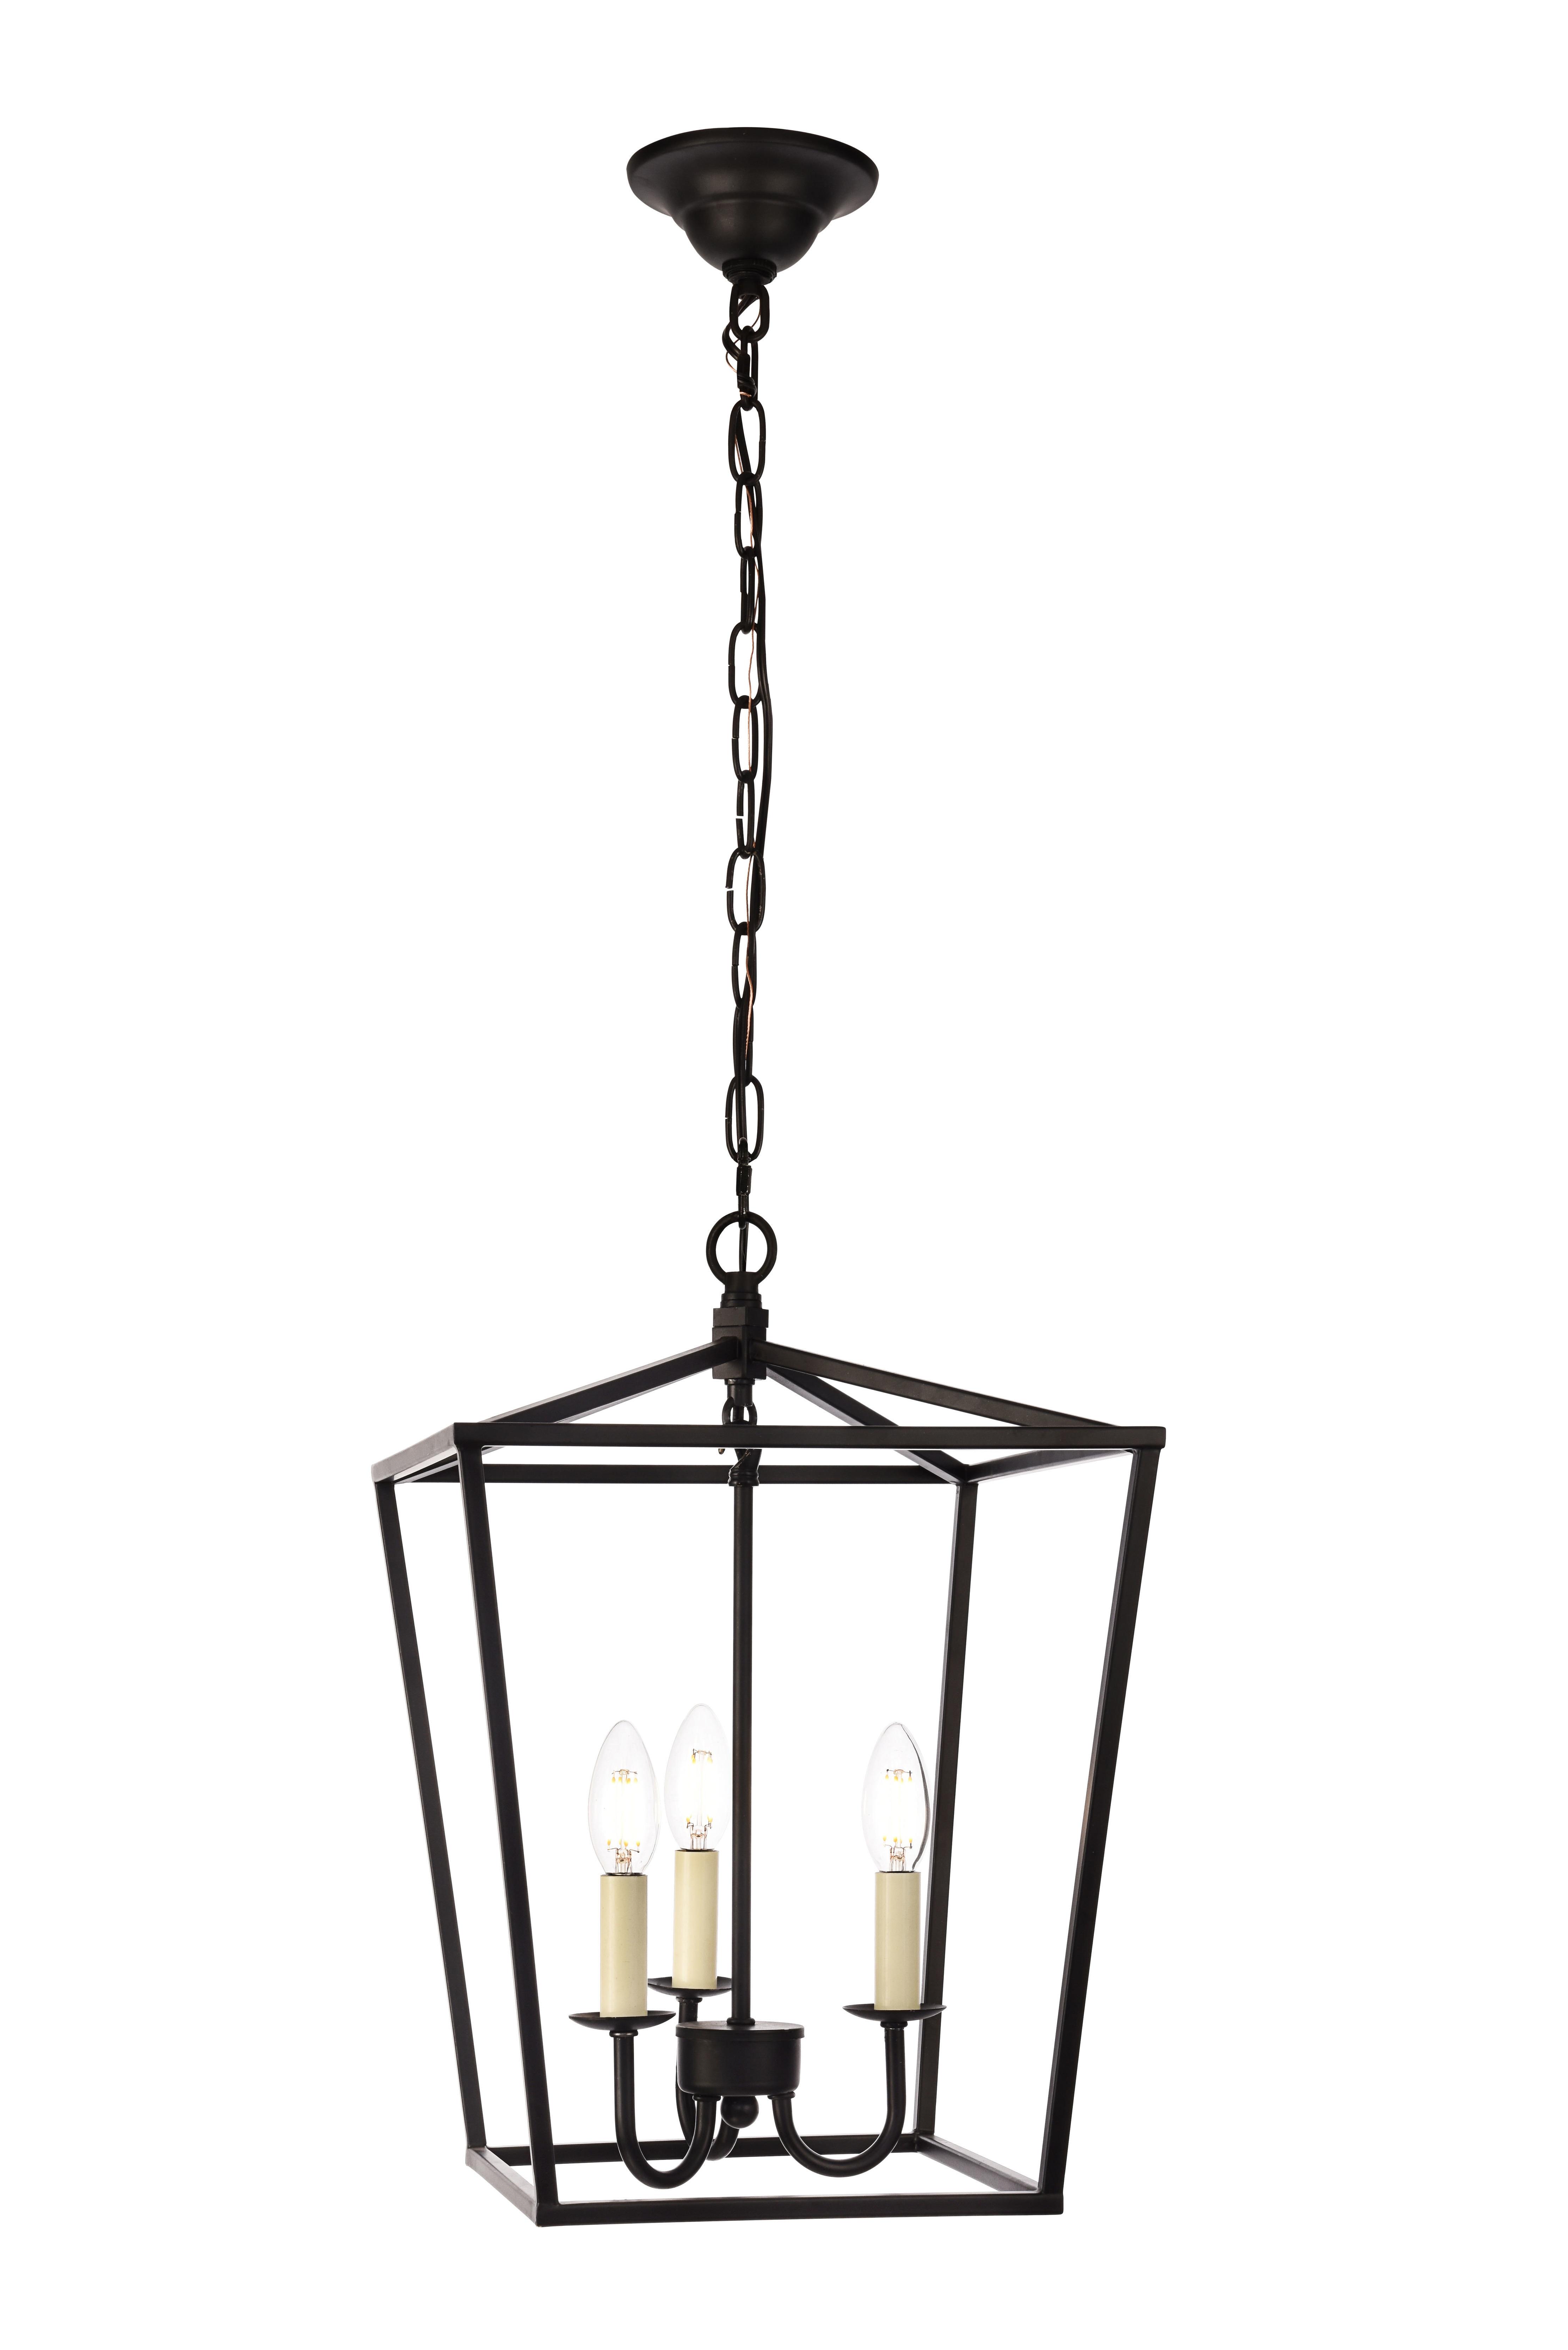 Daphne 3 Light Lantern Pendant For Most Recently Released Finnick 3 Light Lantern Pendants (View 9 of 25)